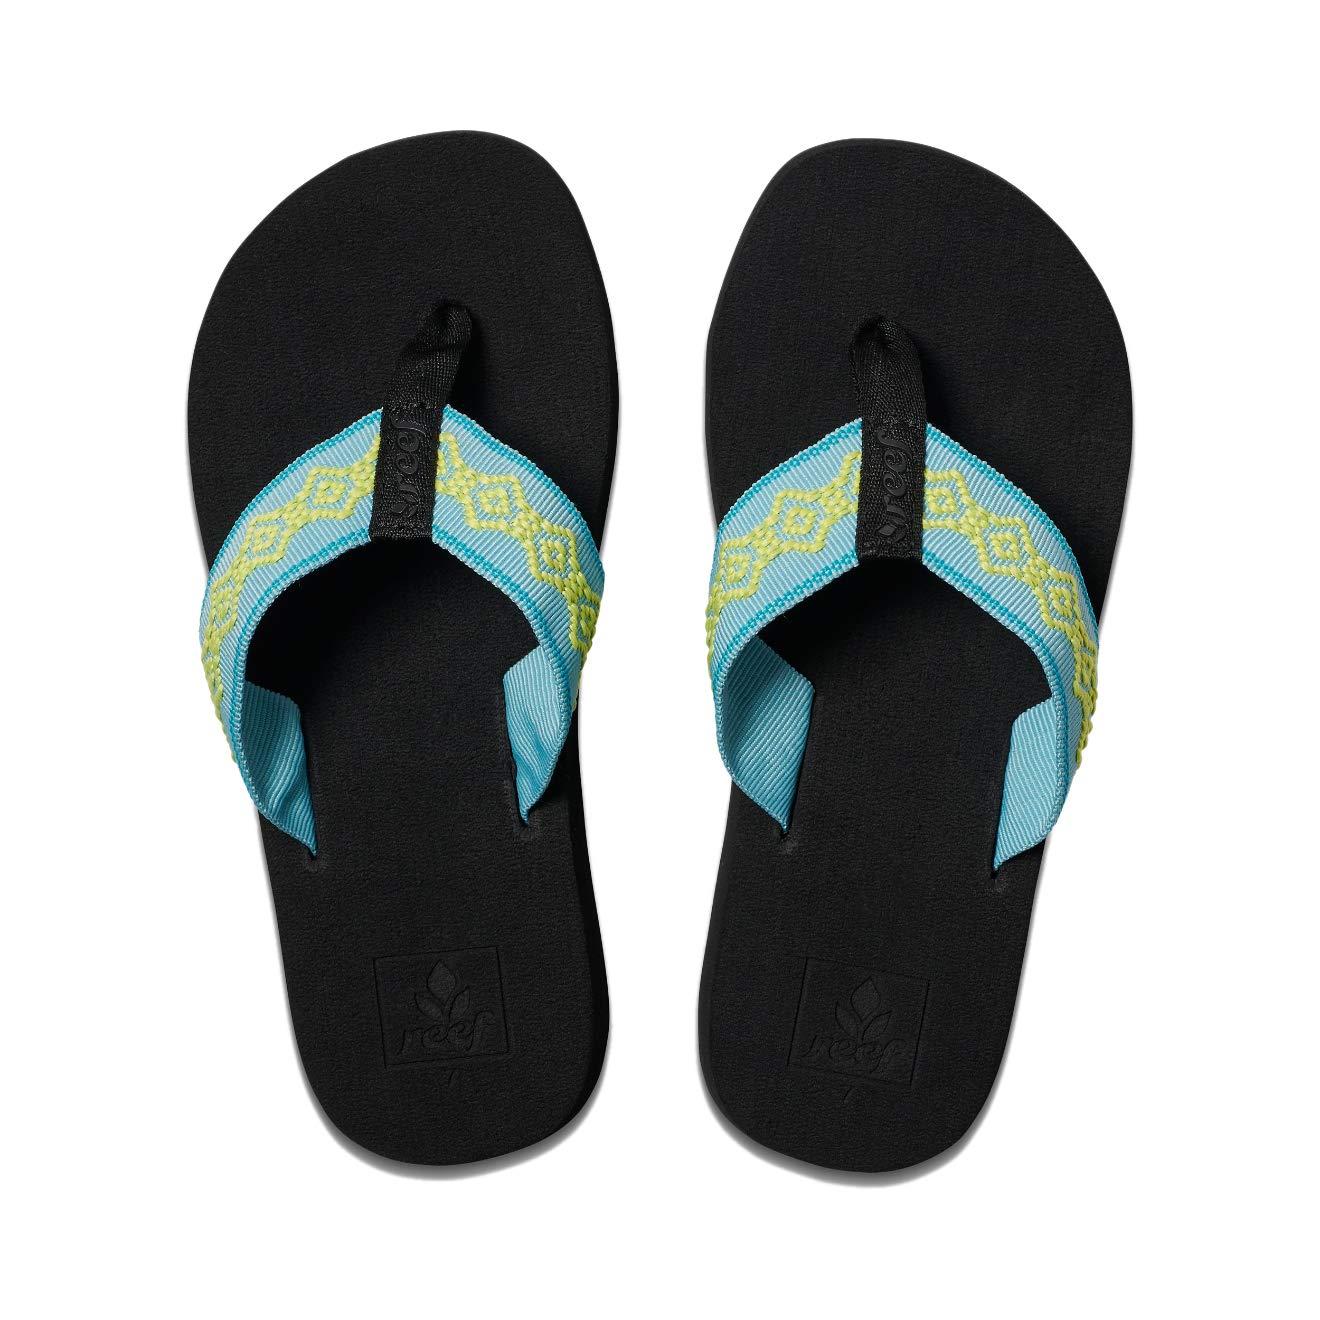 Flip Flops for Women Reef Sandy Womens Sandals